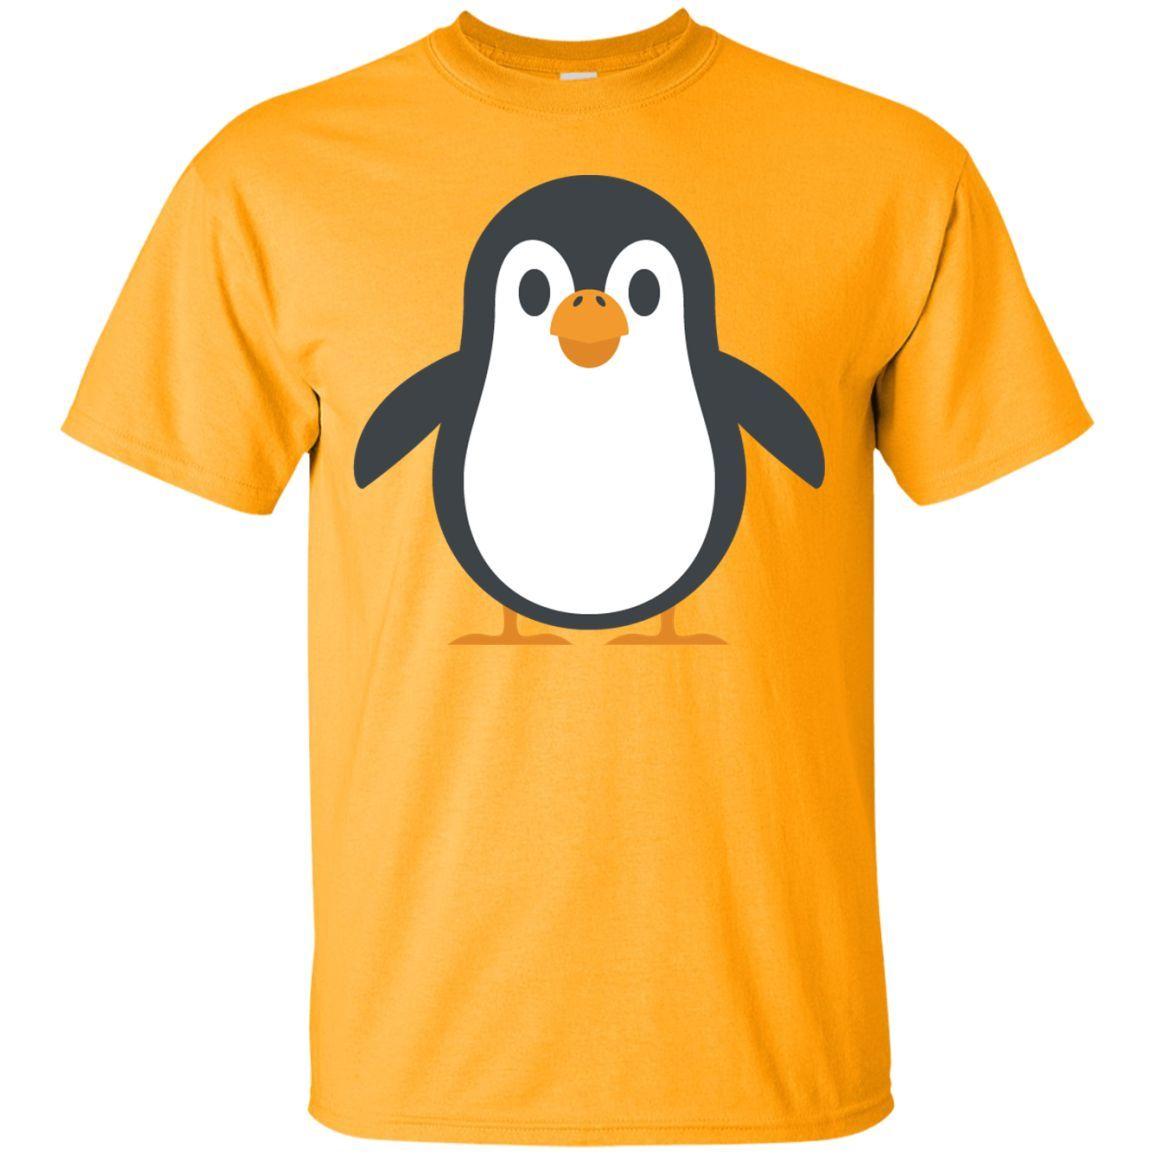 Penguin Emoji Unisex TShirt Shirts, T shirt, Save the